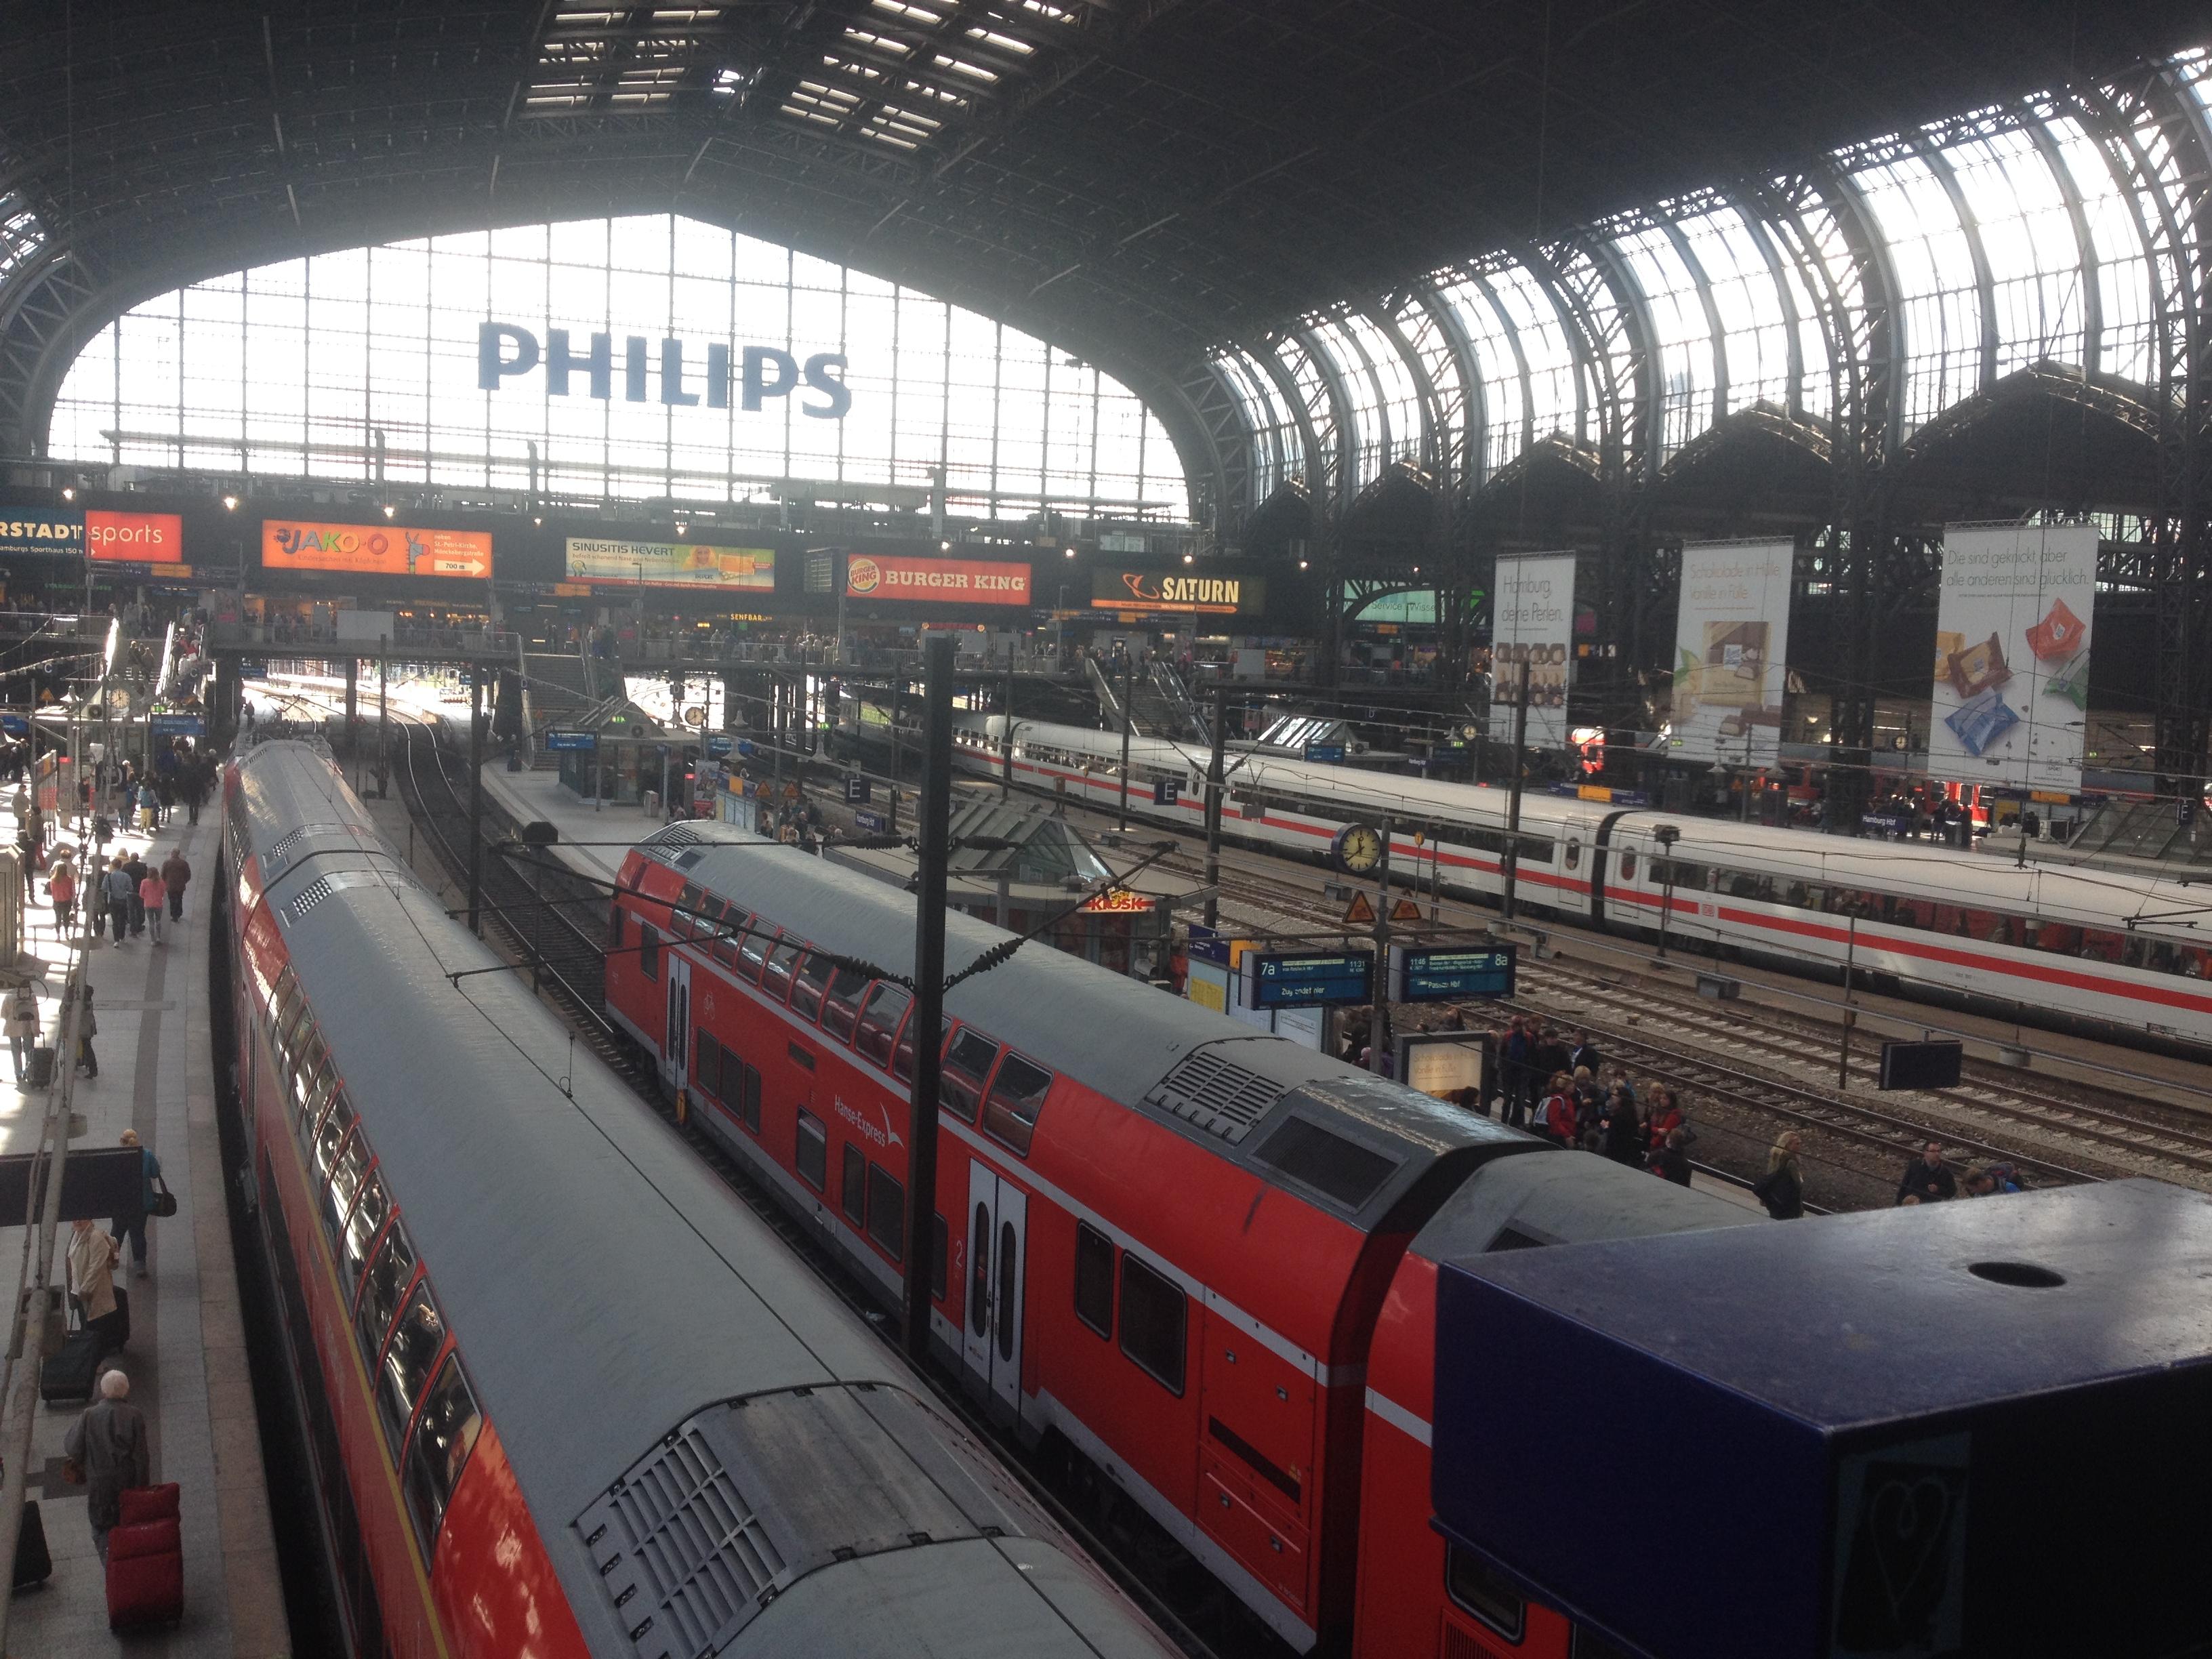 жд вокзал в Гамбурге